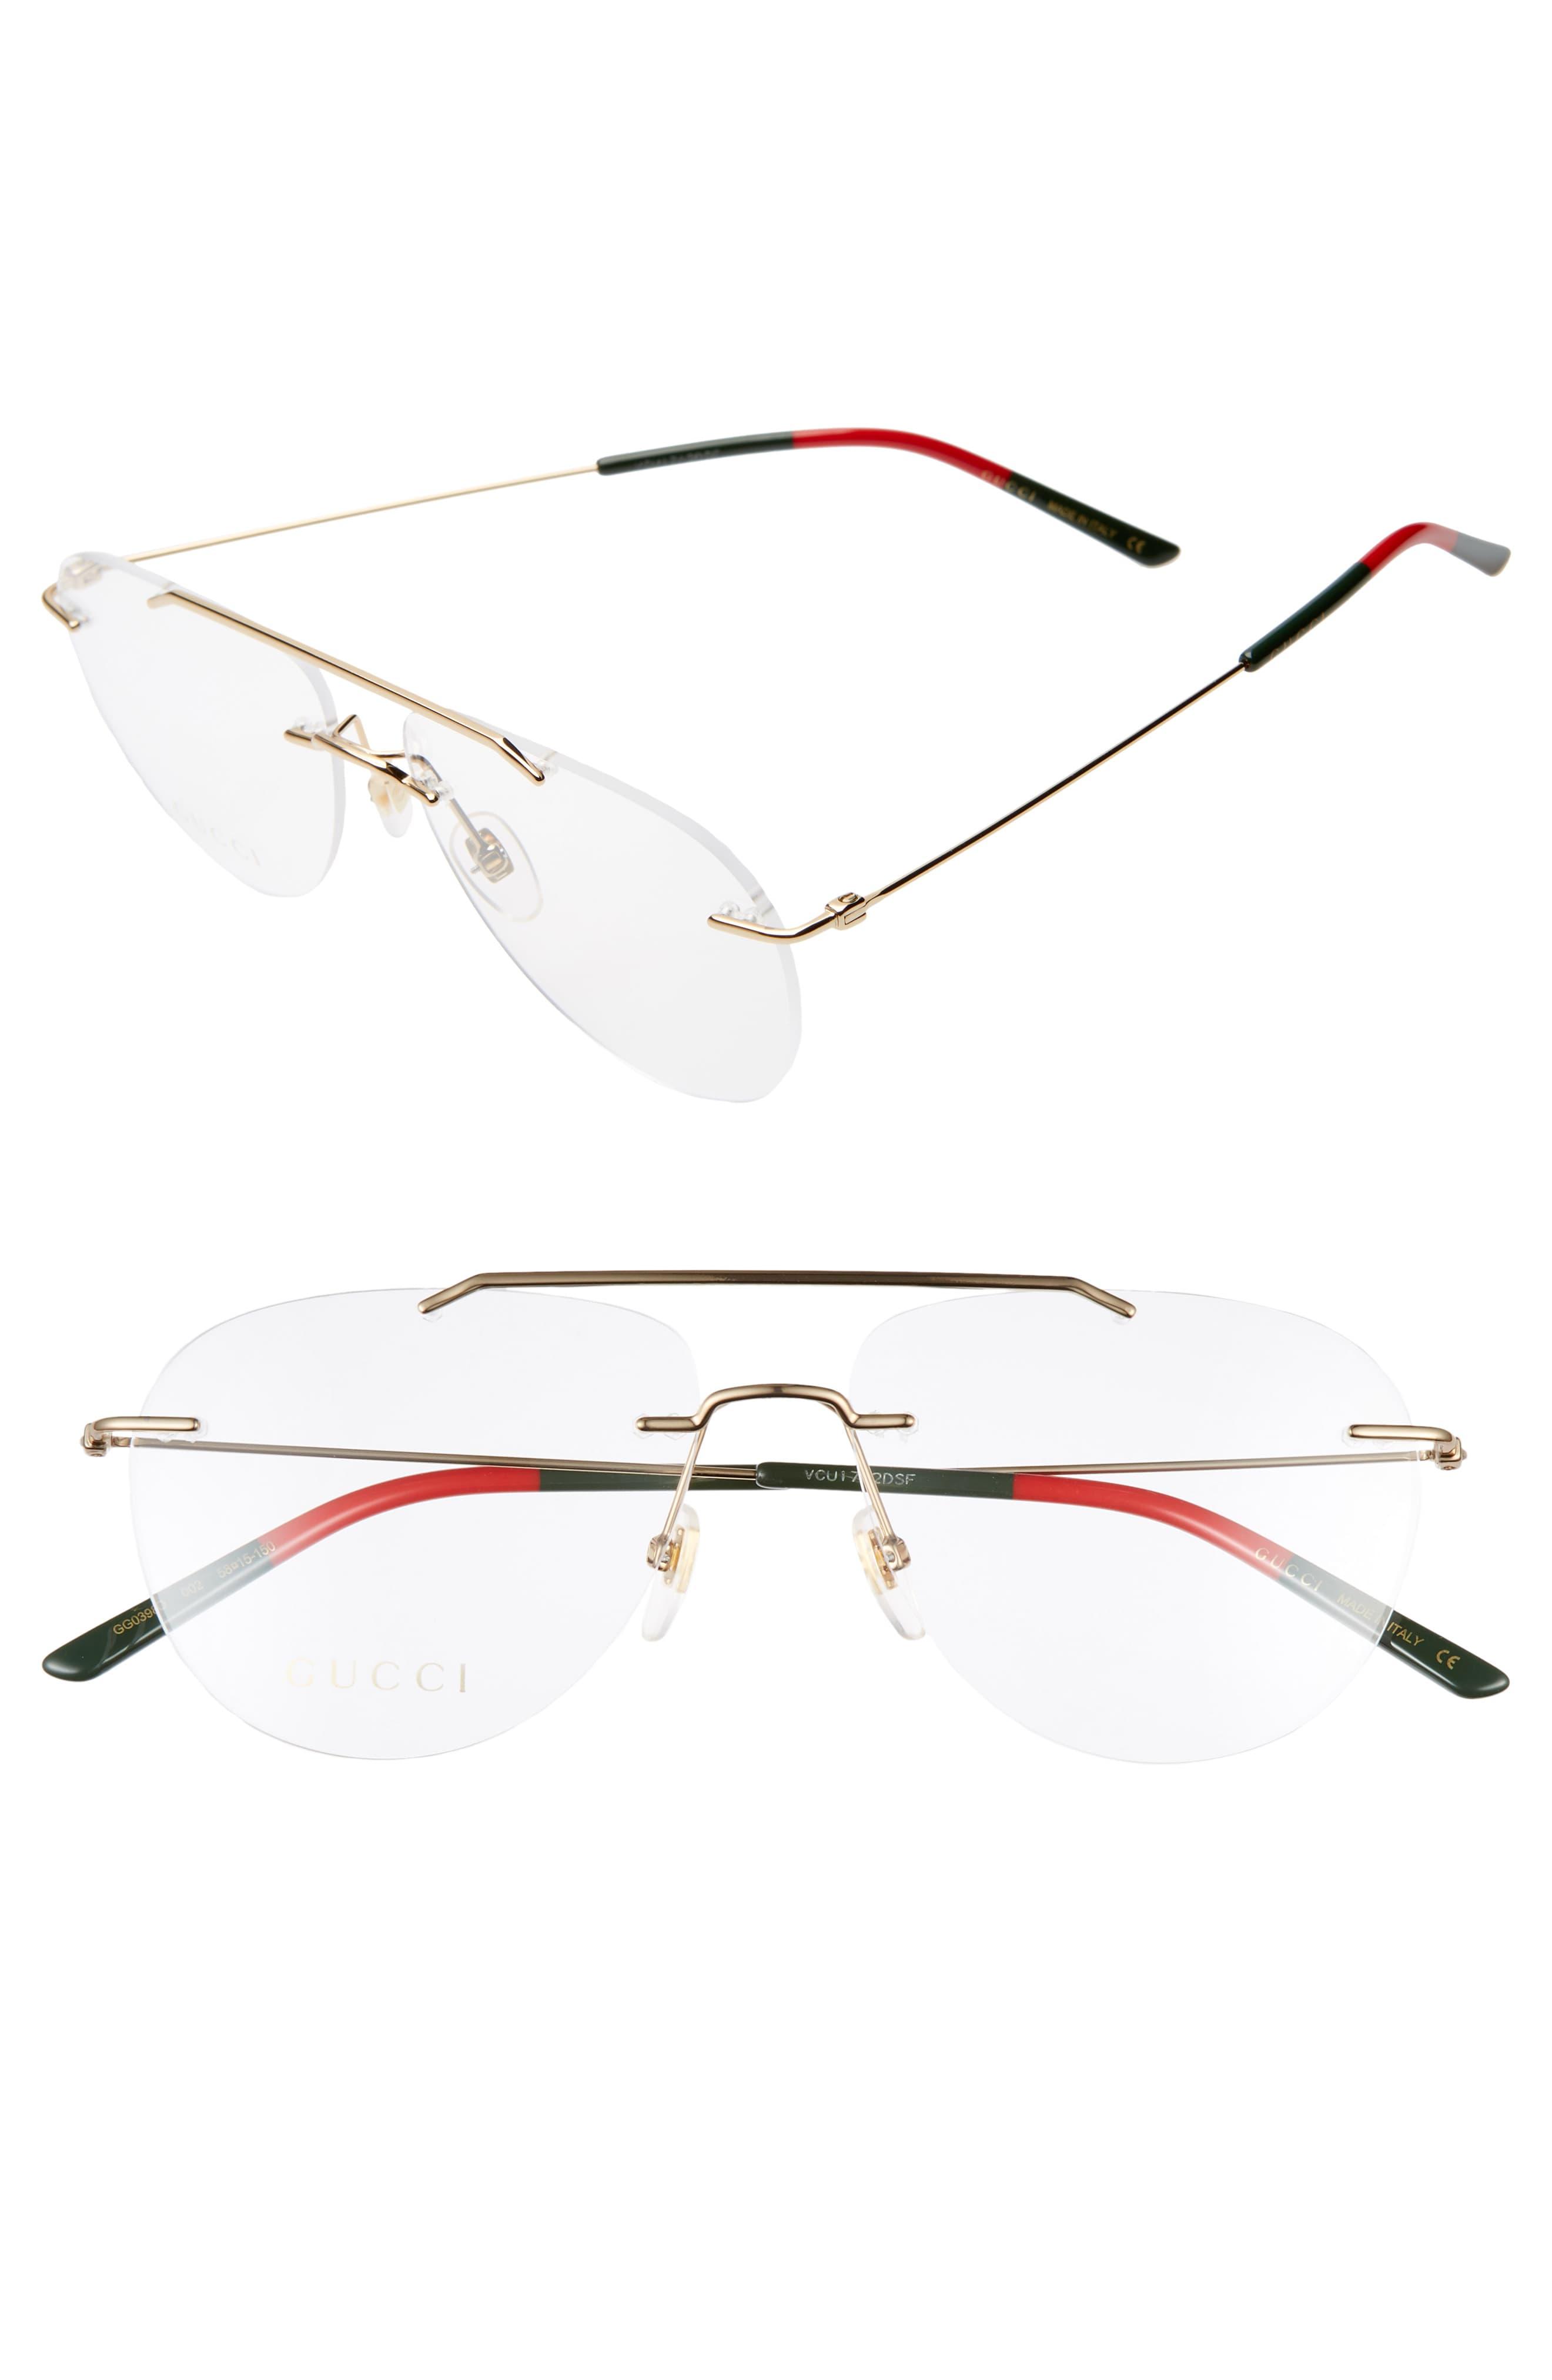 31654195f6d0 Gucci 58Mm Rimless Aviator Optical Glasses –   The Fashionisto